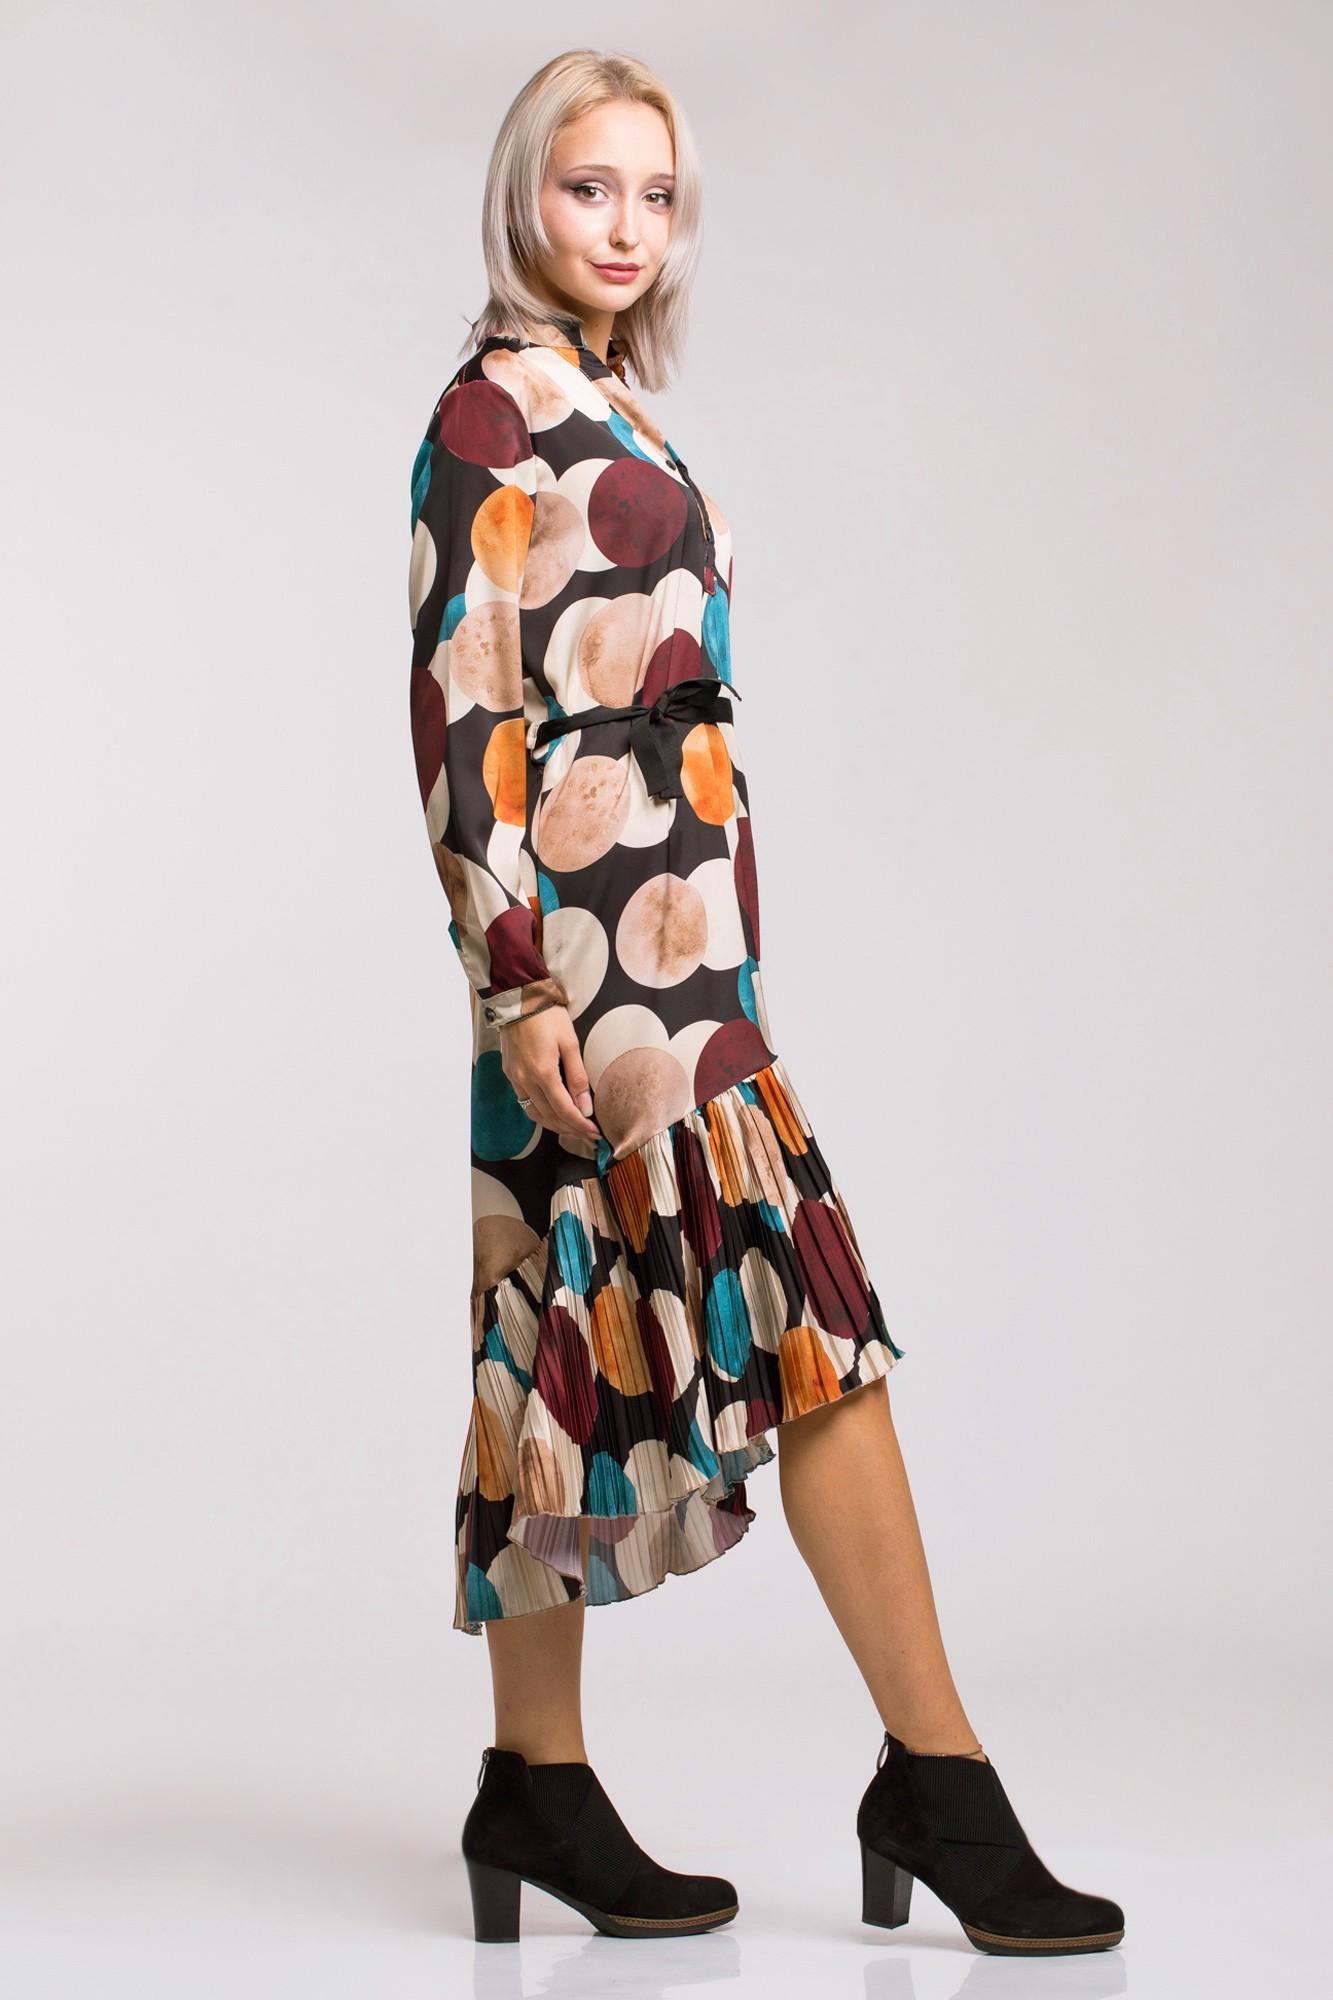 Rochie cu imprimeu retro, volan asimetric plisat si cordon negru